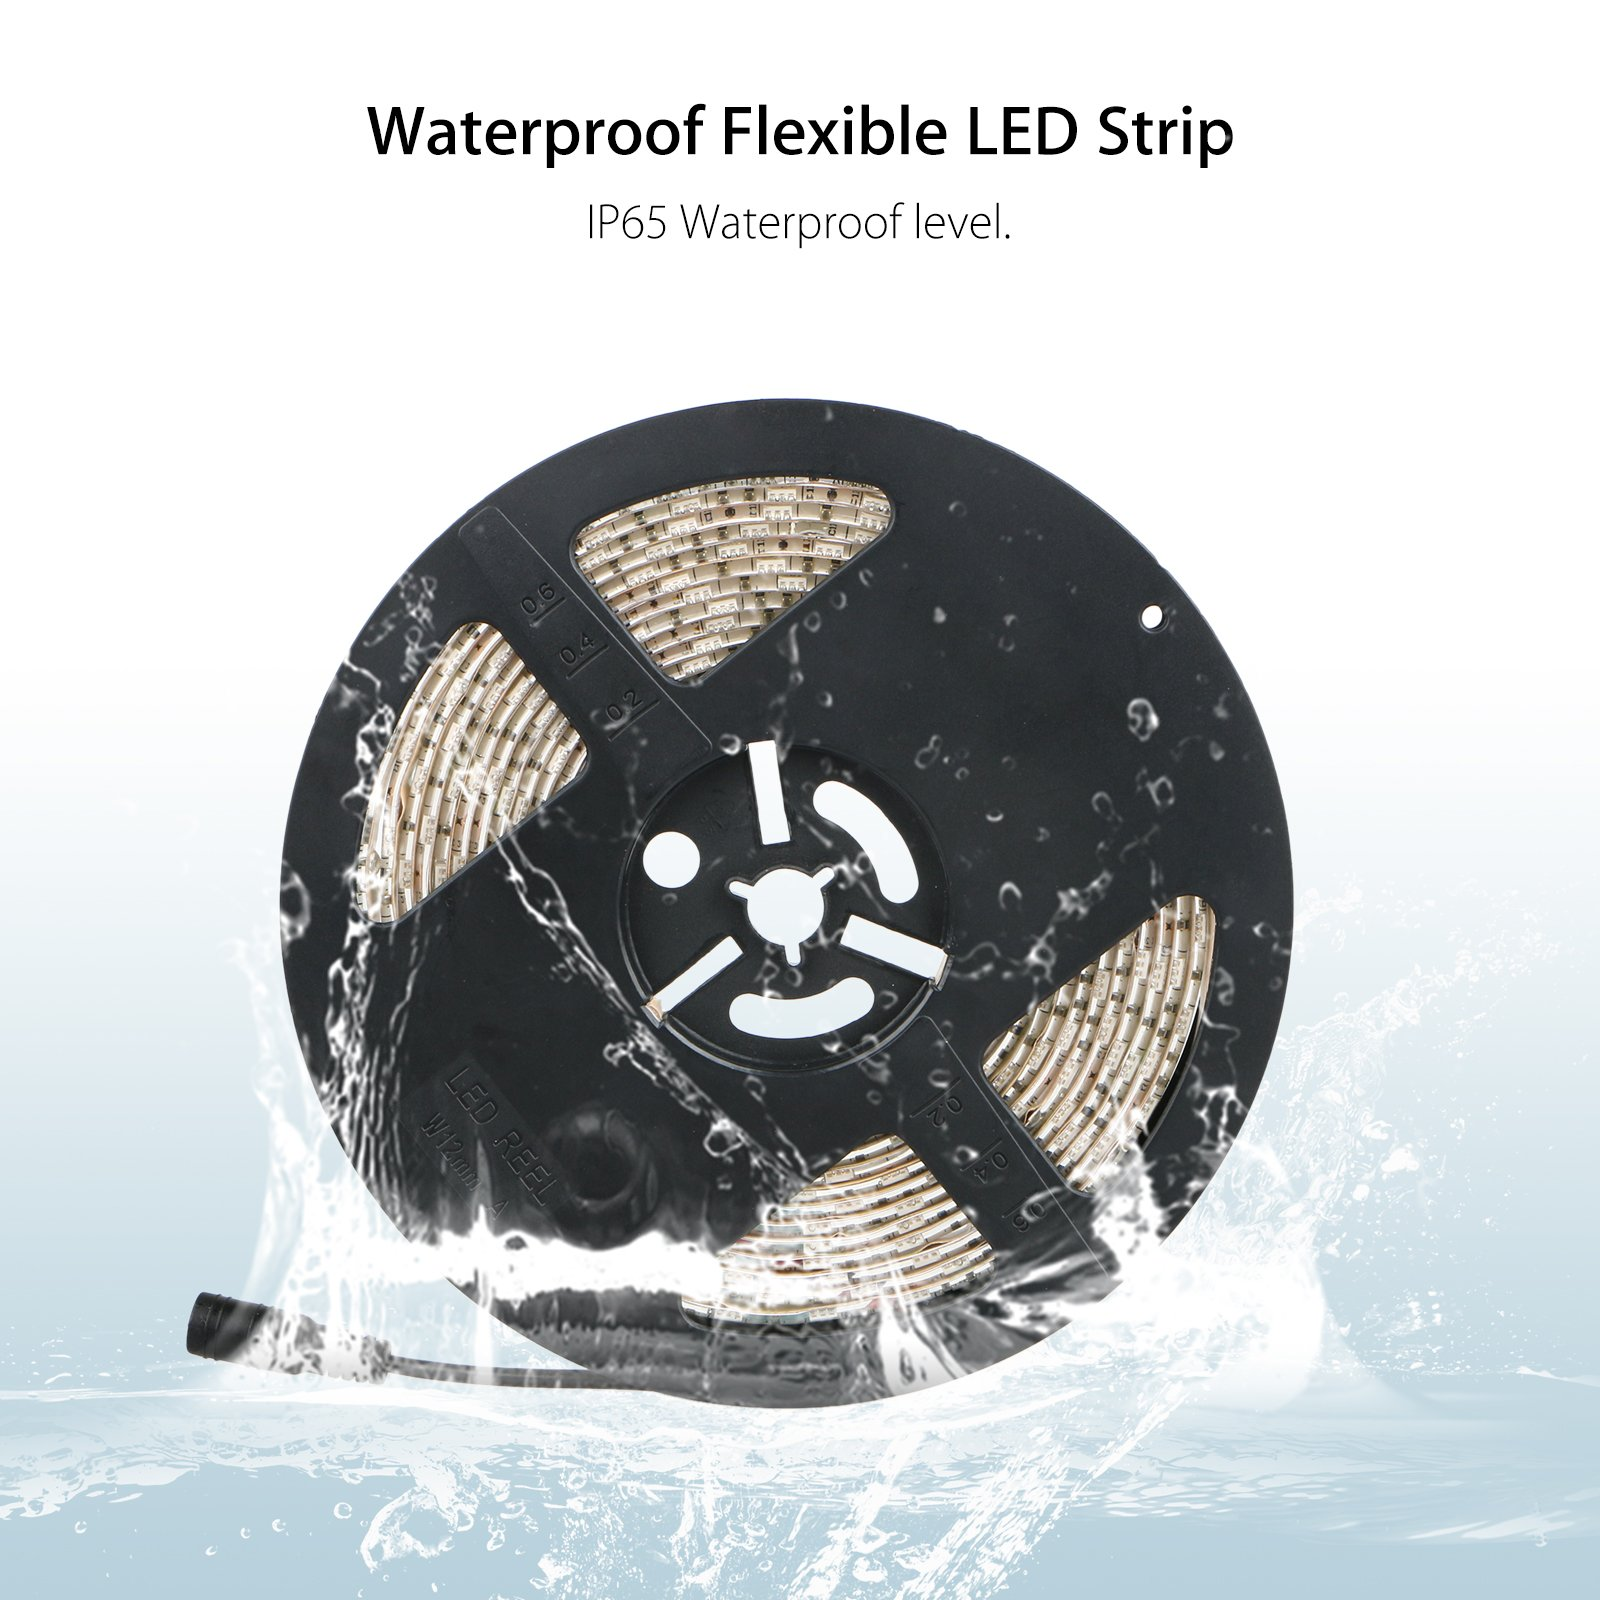 LinkStyle UV Black Lights LED Strip, 16.4Ft 300 LEDs 5050 SMD Ultraviolet Light UV LED Strip Light, Flexible & IP65 Waterproof DC 12V Purple Light Night Fishing(Power Adapter Not Included) by LinkStyle (Image #5)